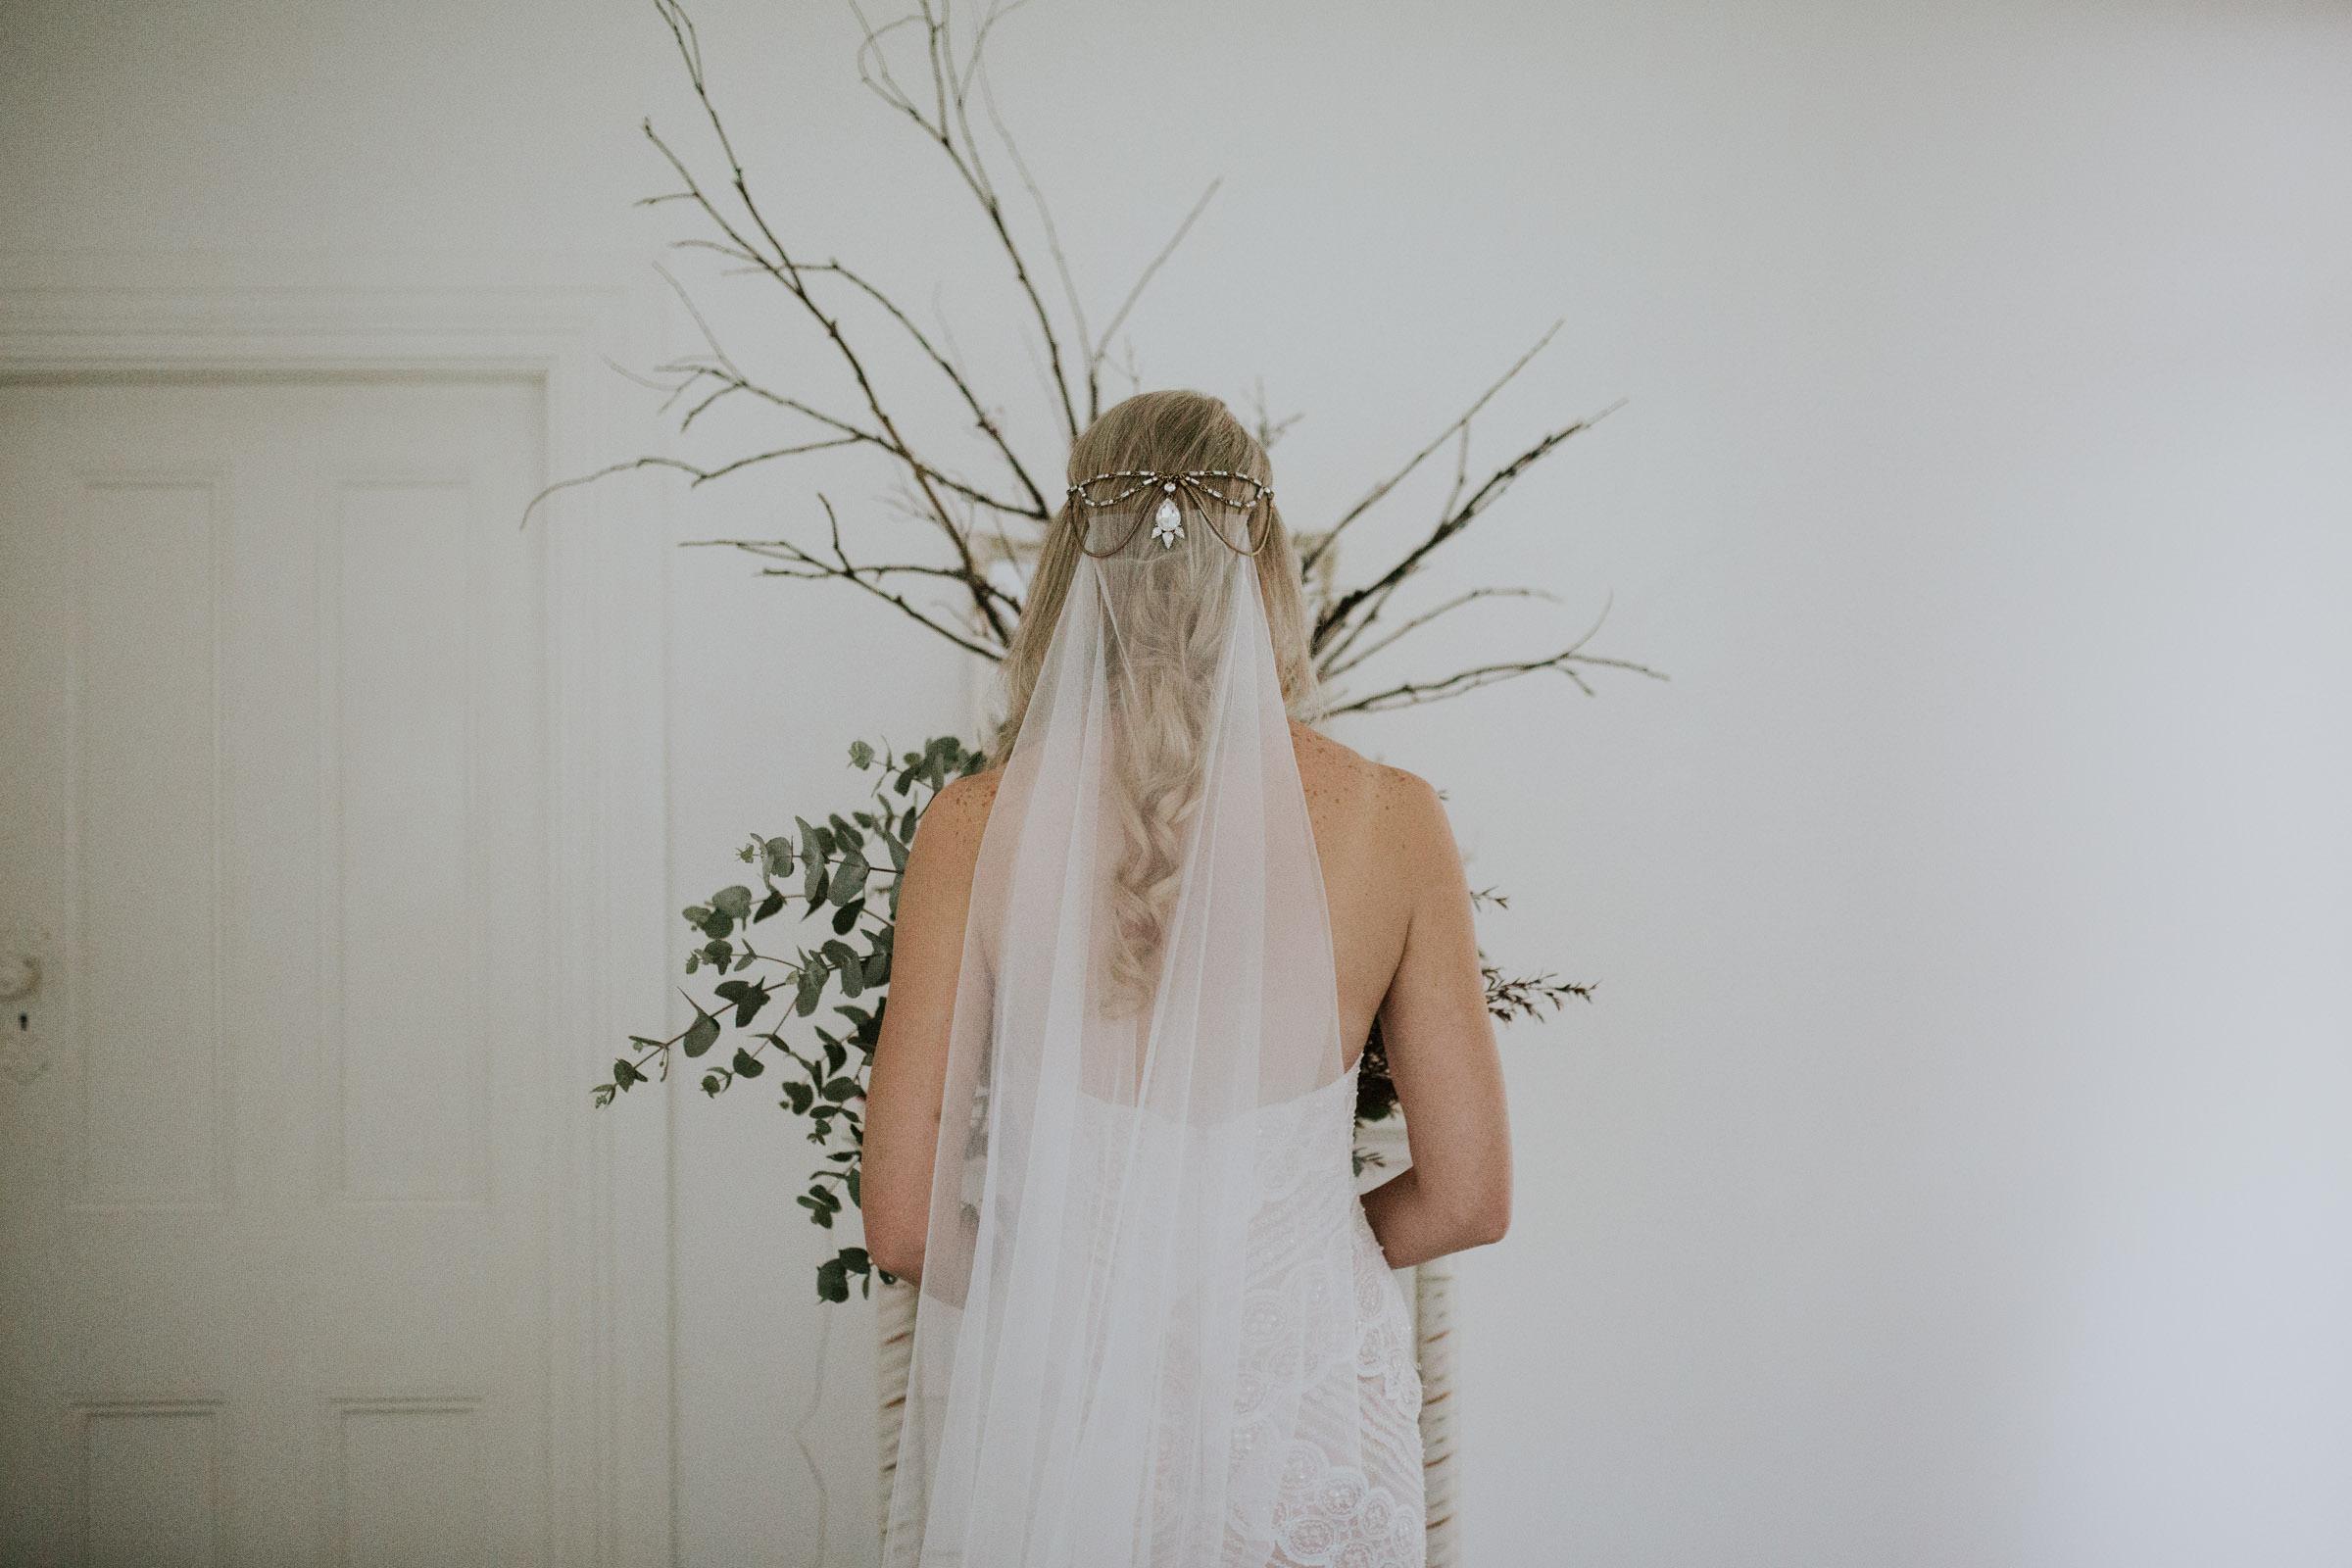 Emma+John+Far+South+Coast+Wedding+Festivl+Glamping+Bush-57.jpg